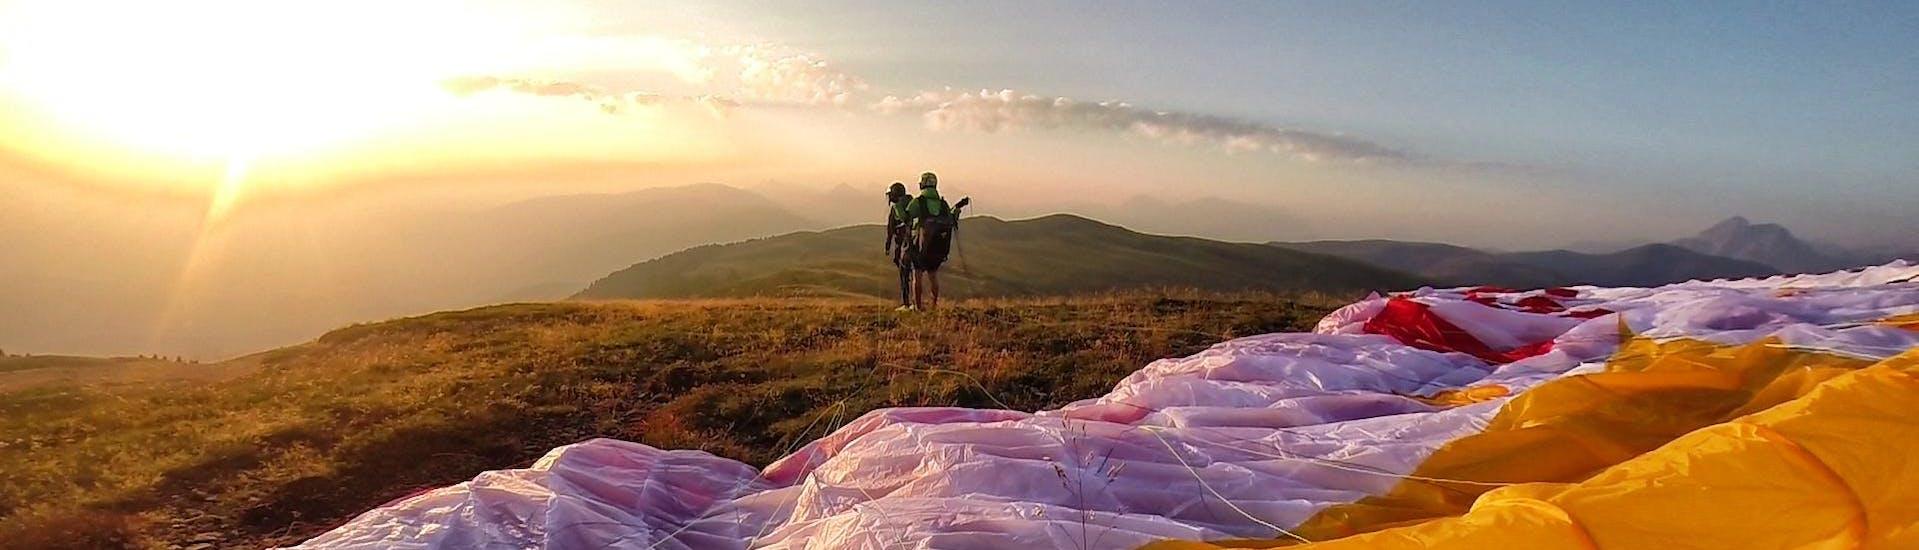 HIKE & Fly Tandem Paragliding SUNRISE